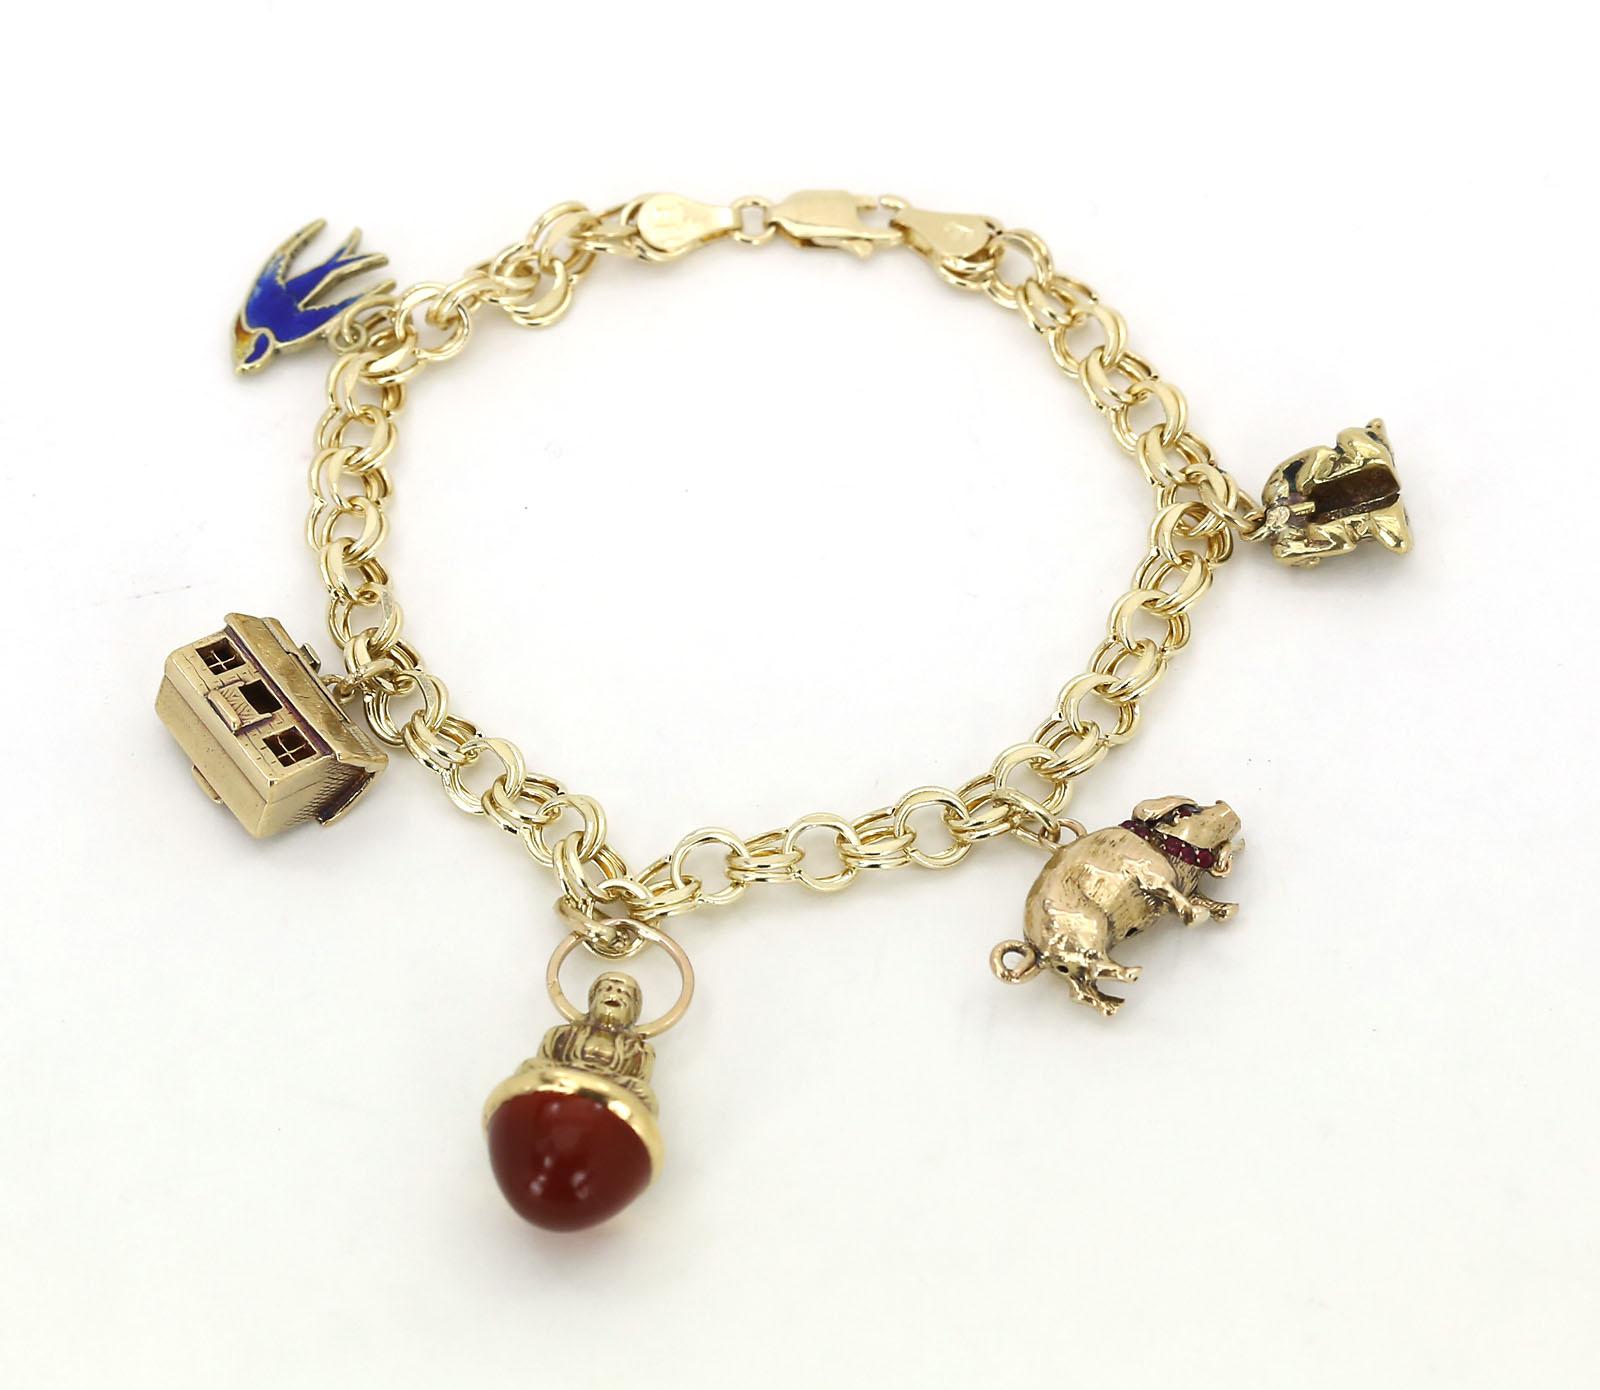 14k Yellow Gold Charm Bracelet: VINTAGE 14K YELLOW GOLD DOUBLE LINK CHARM BRACELET W/ 5